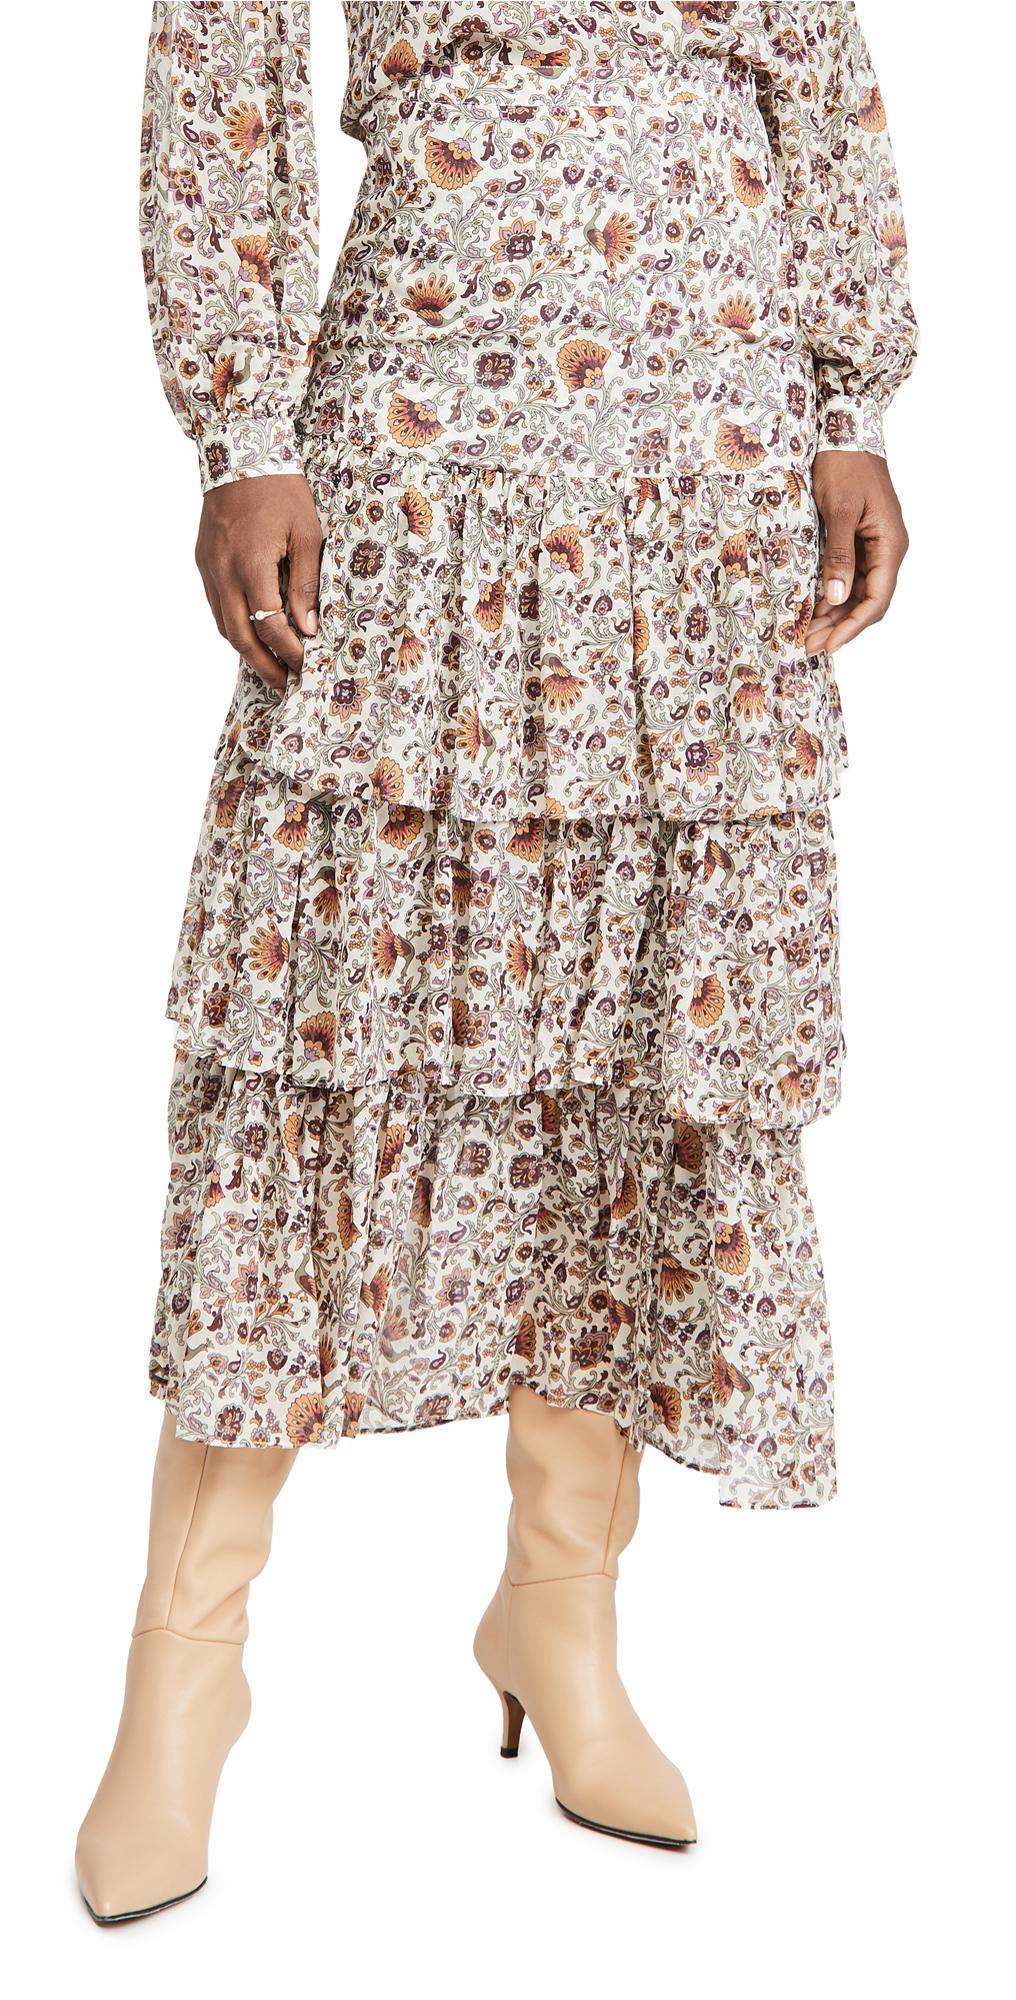 Veronica Beard Shailene Skirt